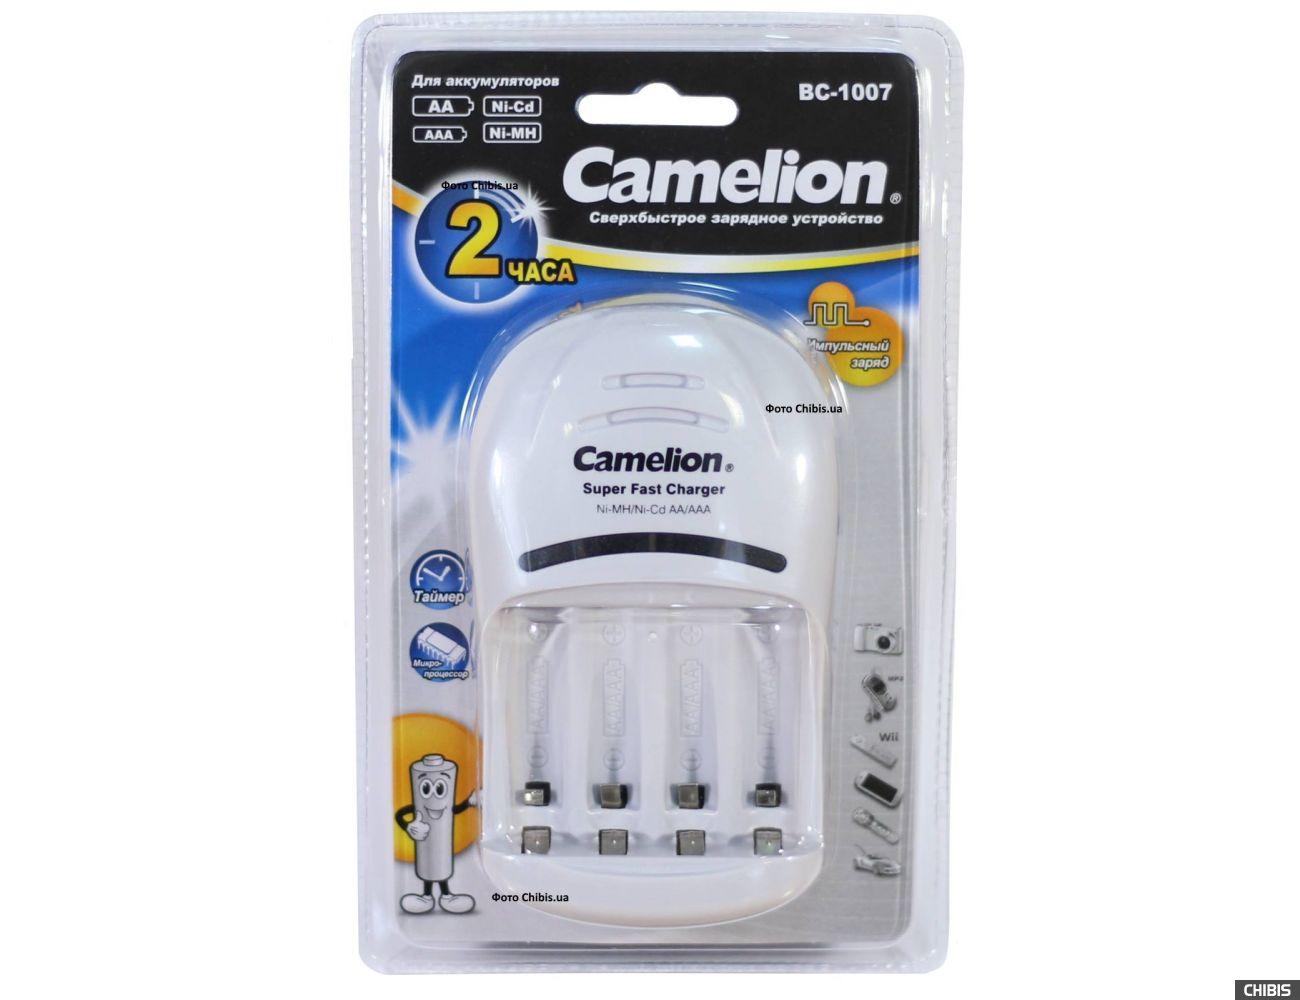 Зарядное устройство АА ААА Camelion BC-1007